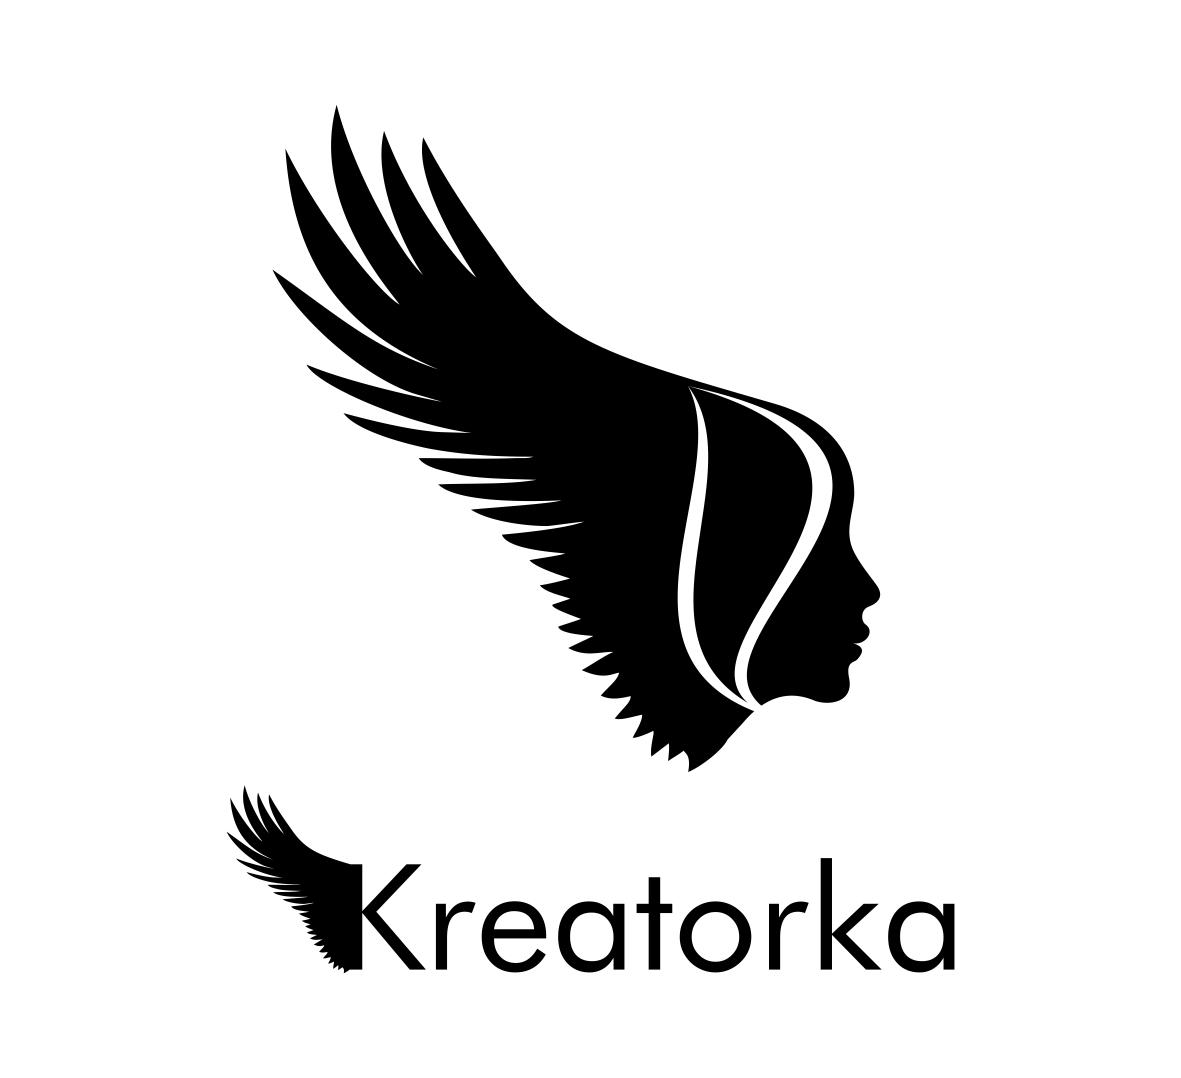 kreatorka_logo_BW_300dpi